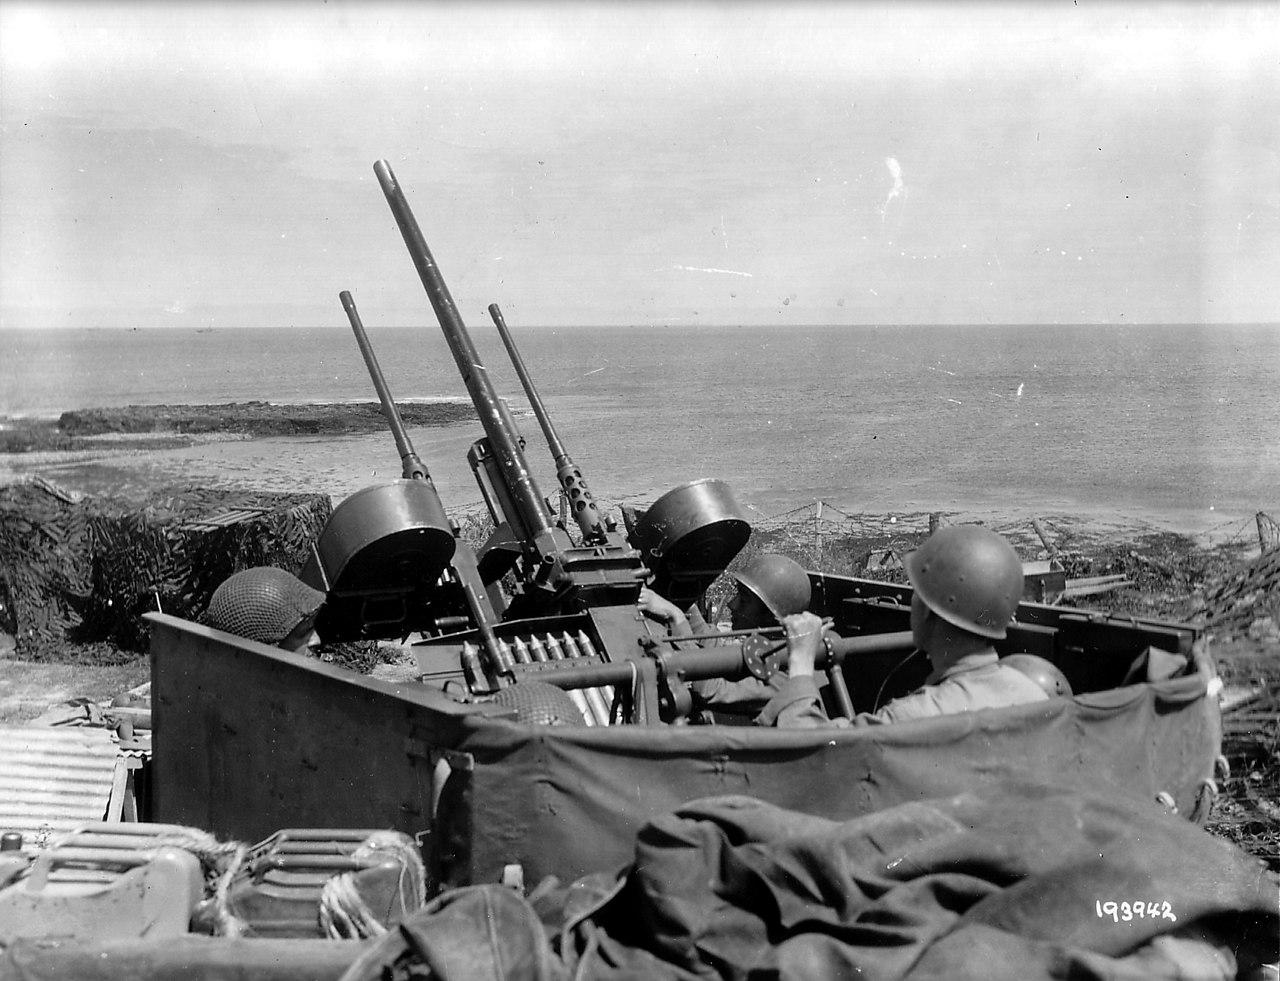 1280px-M15_Halftrack_in_Normandy.jpg